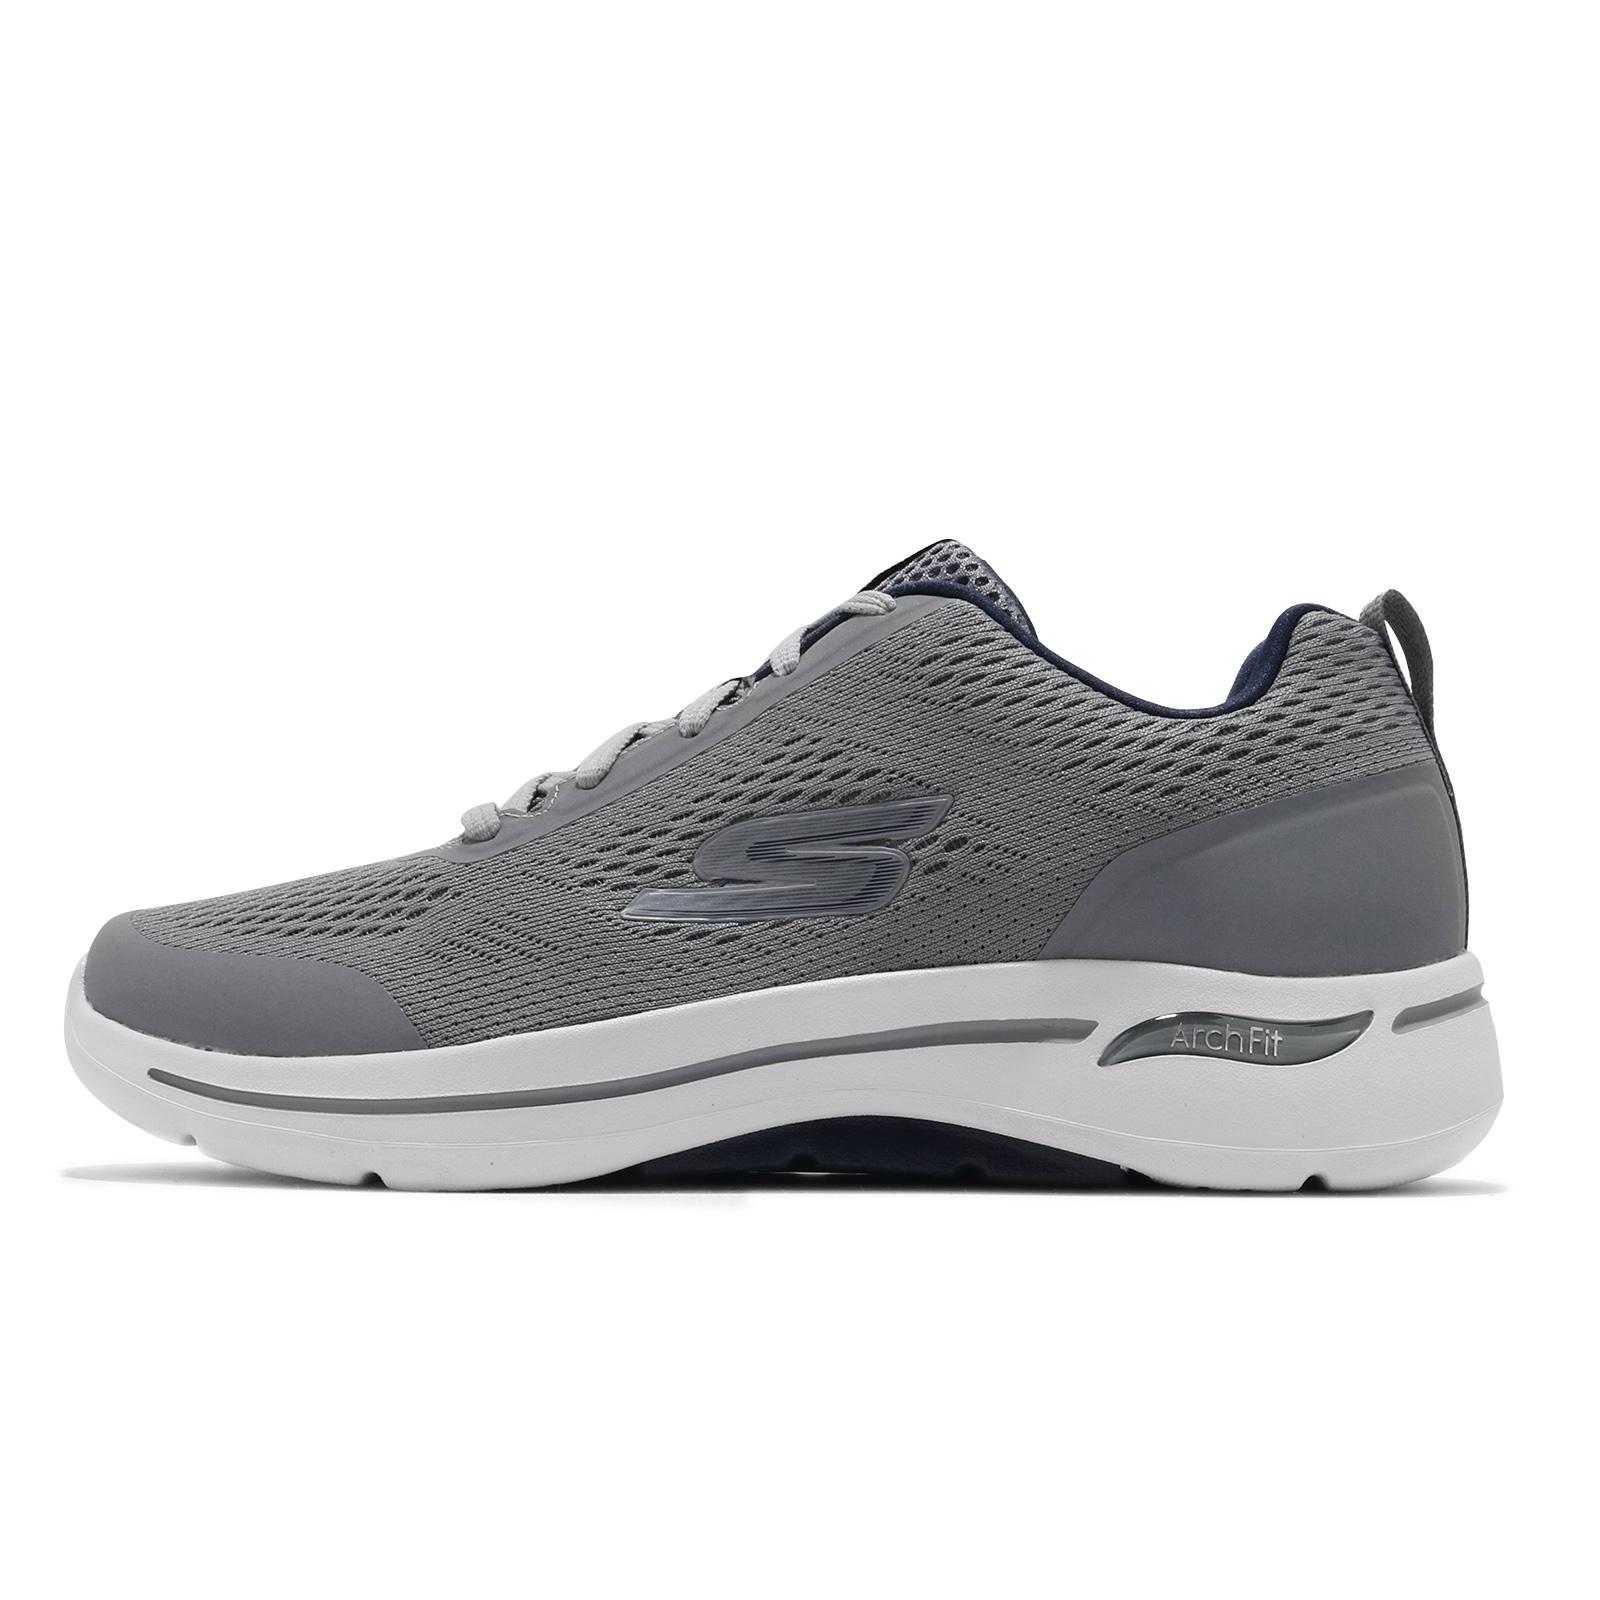 Skechers 健走鞋 Go Walk Arch Fit 灰 白 運動鞋 男鞋 醫師推薦 ACS 216116GYNV